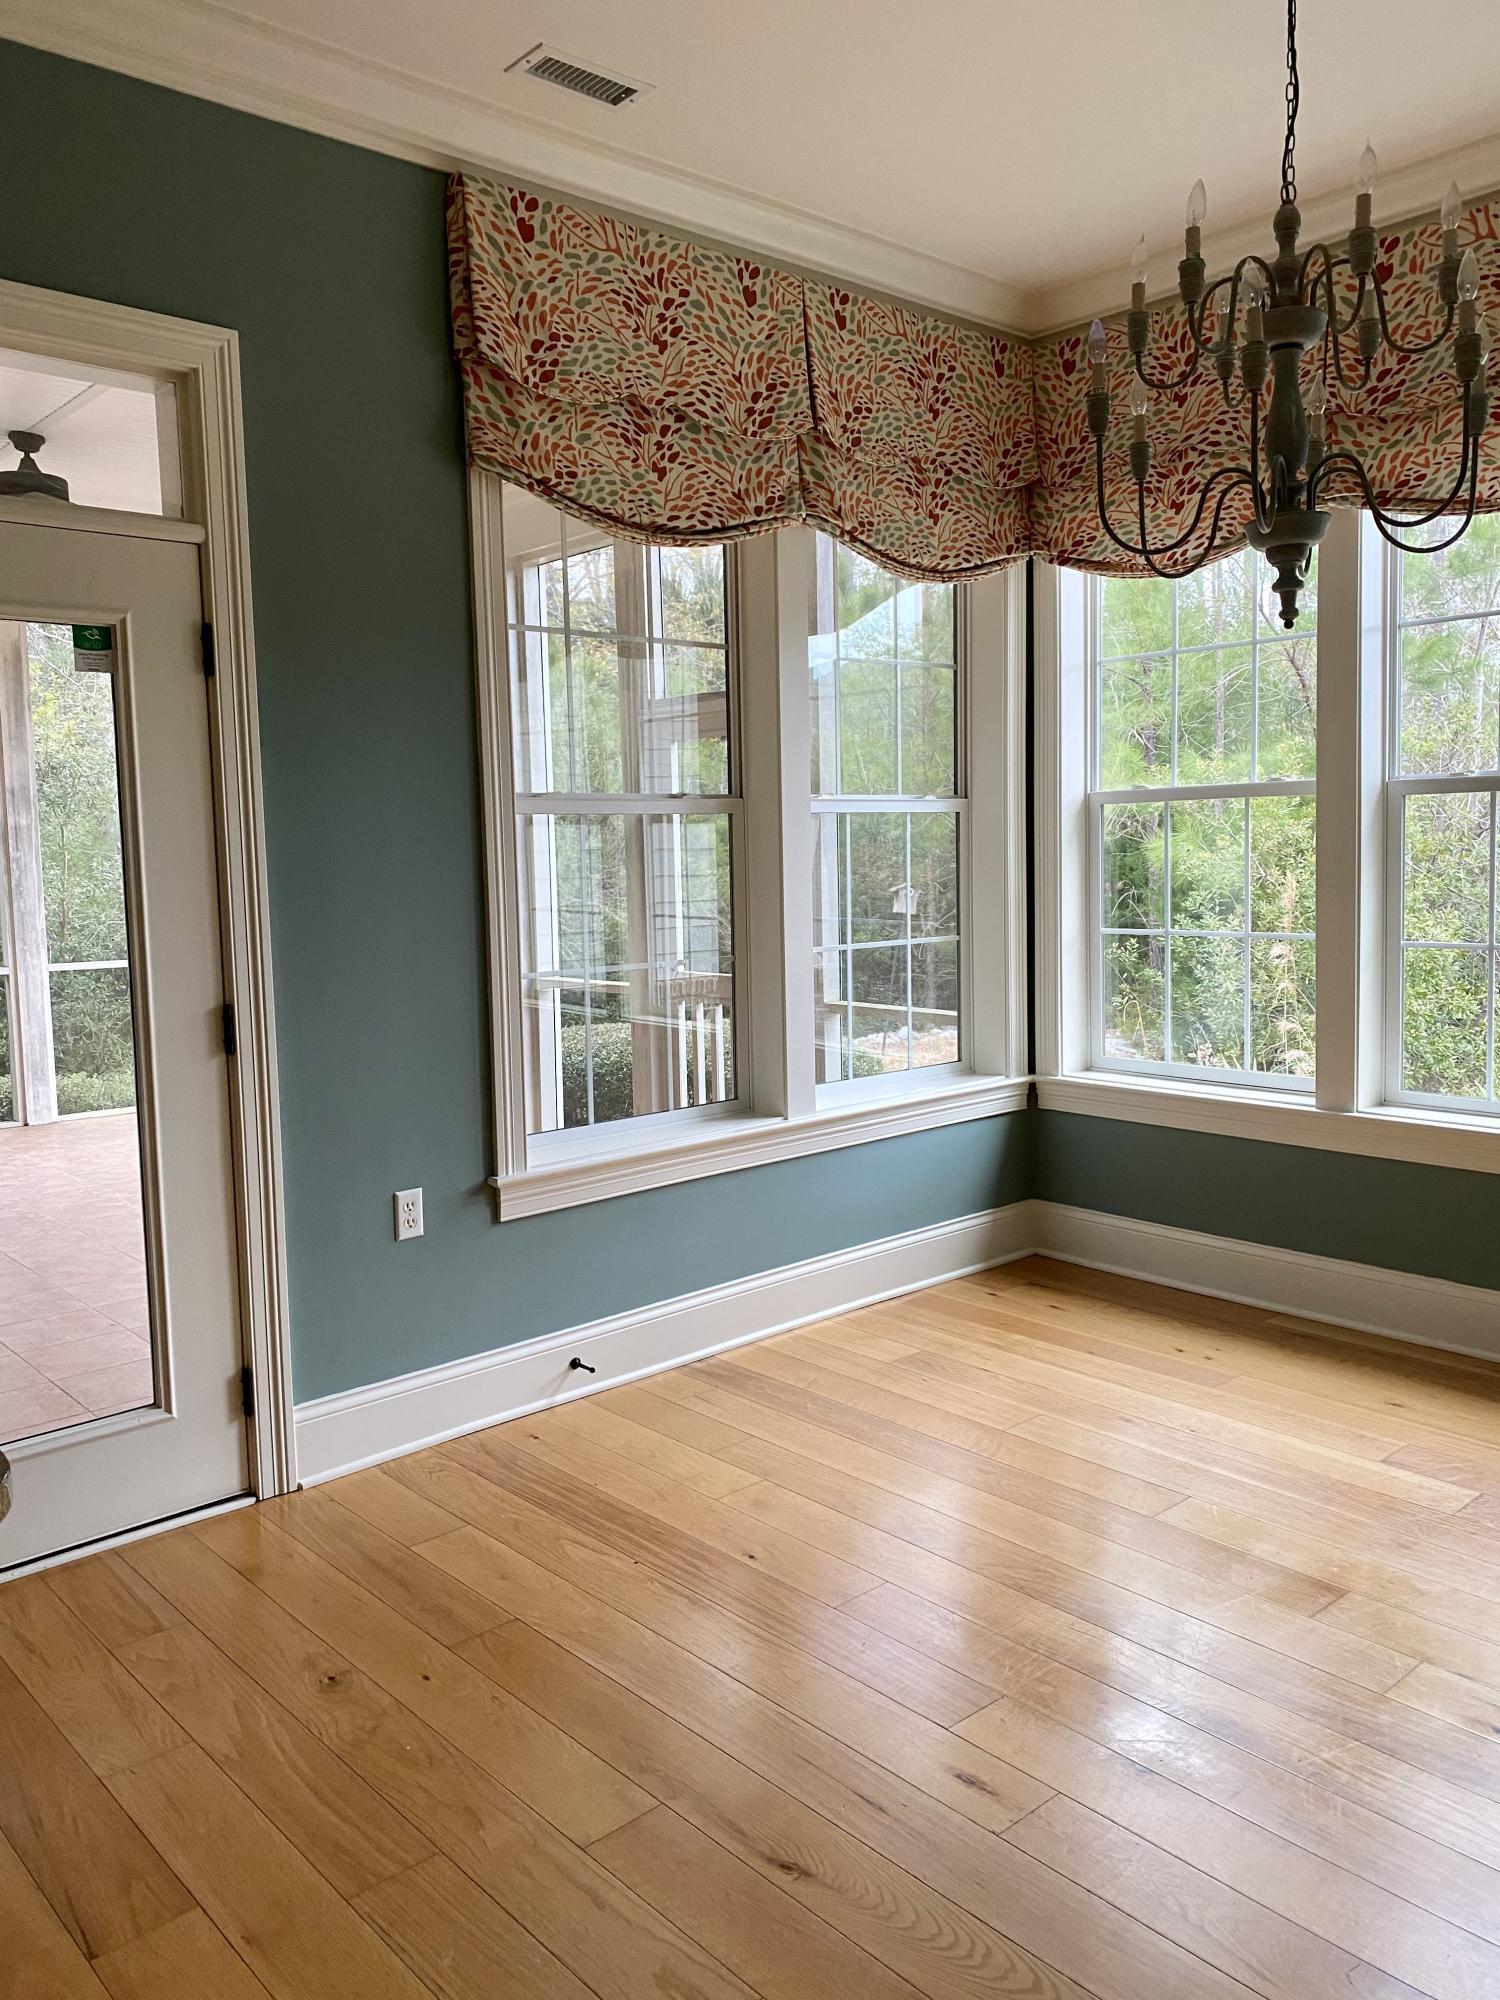 Park West Homes For Sale - 3090 Rice Field, Mount Pleasant, SC - 4